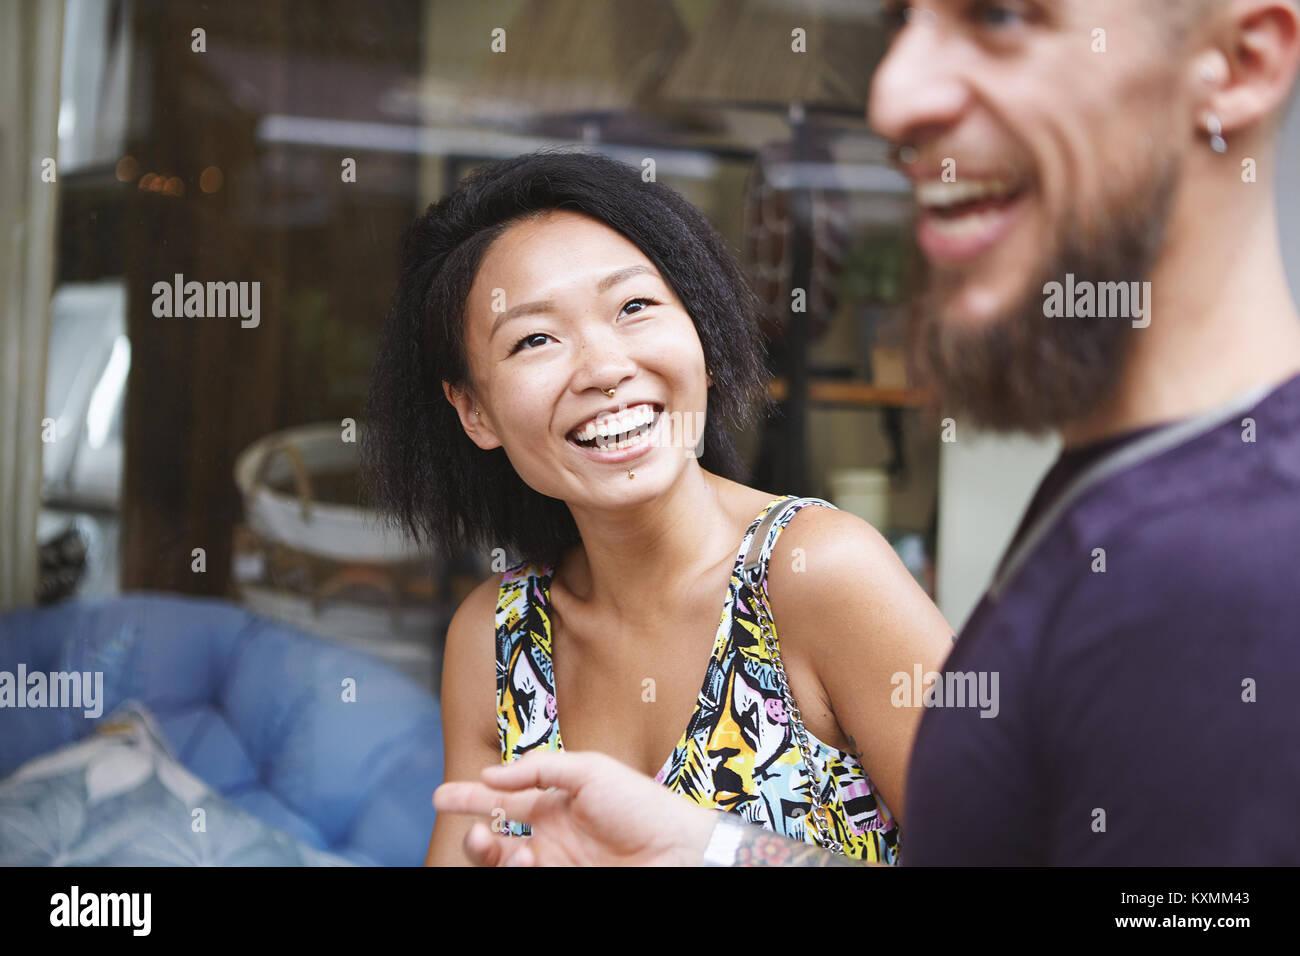 Hipster multi ethnic couple window shopping, Concession Française de Shanghai Shanghai,Chine, Photo Stock